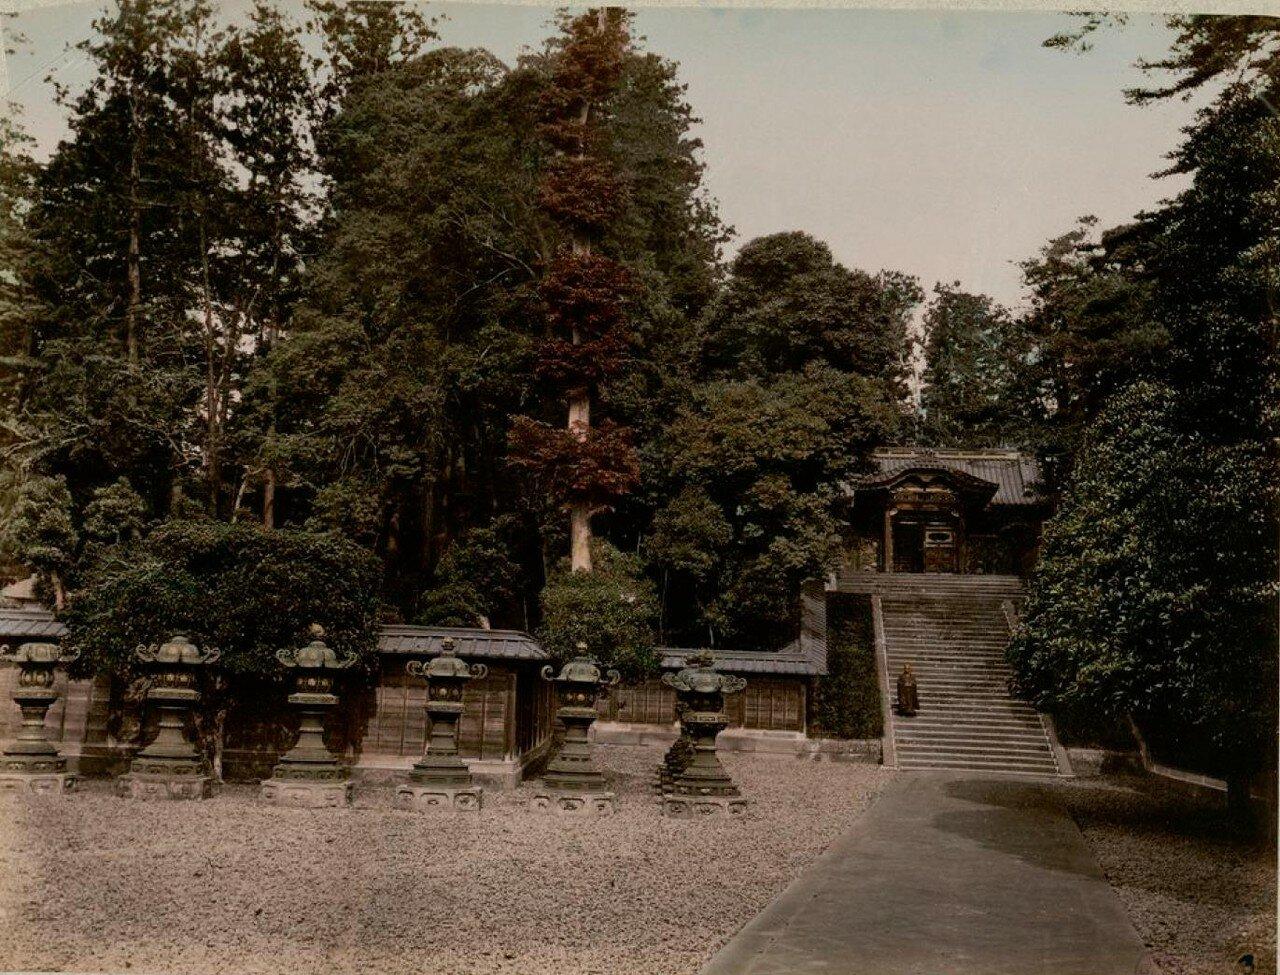 Токио. Парк Сиба. Двор фонарей